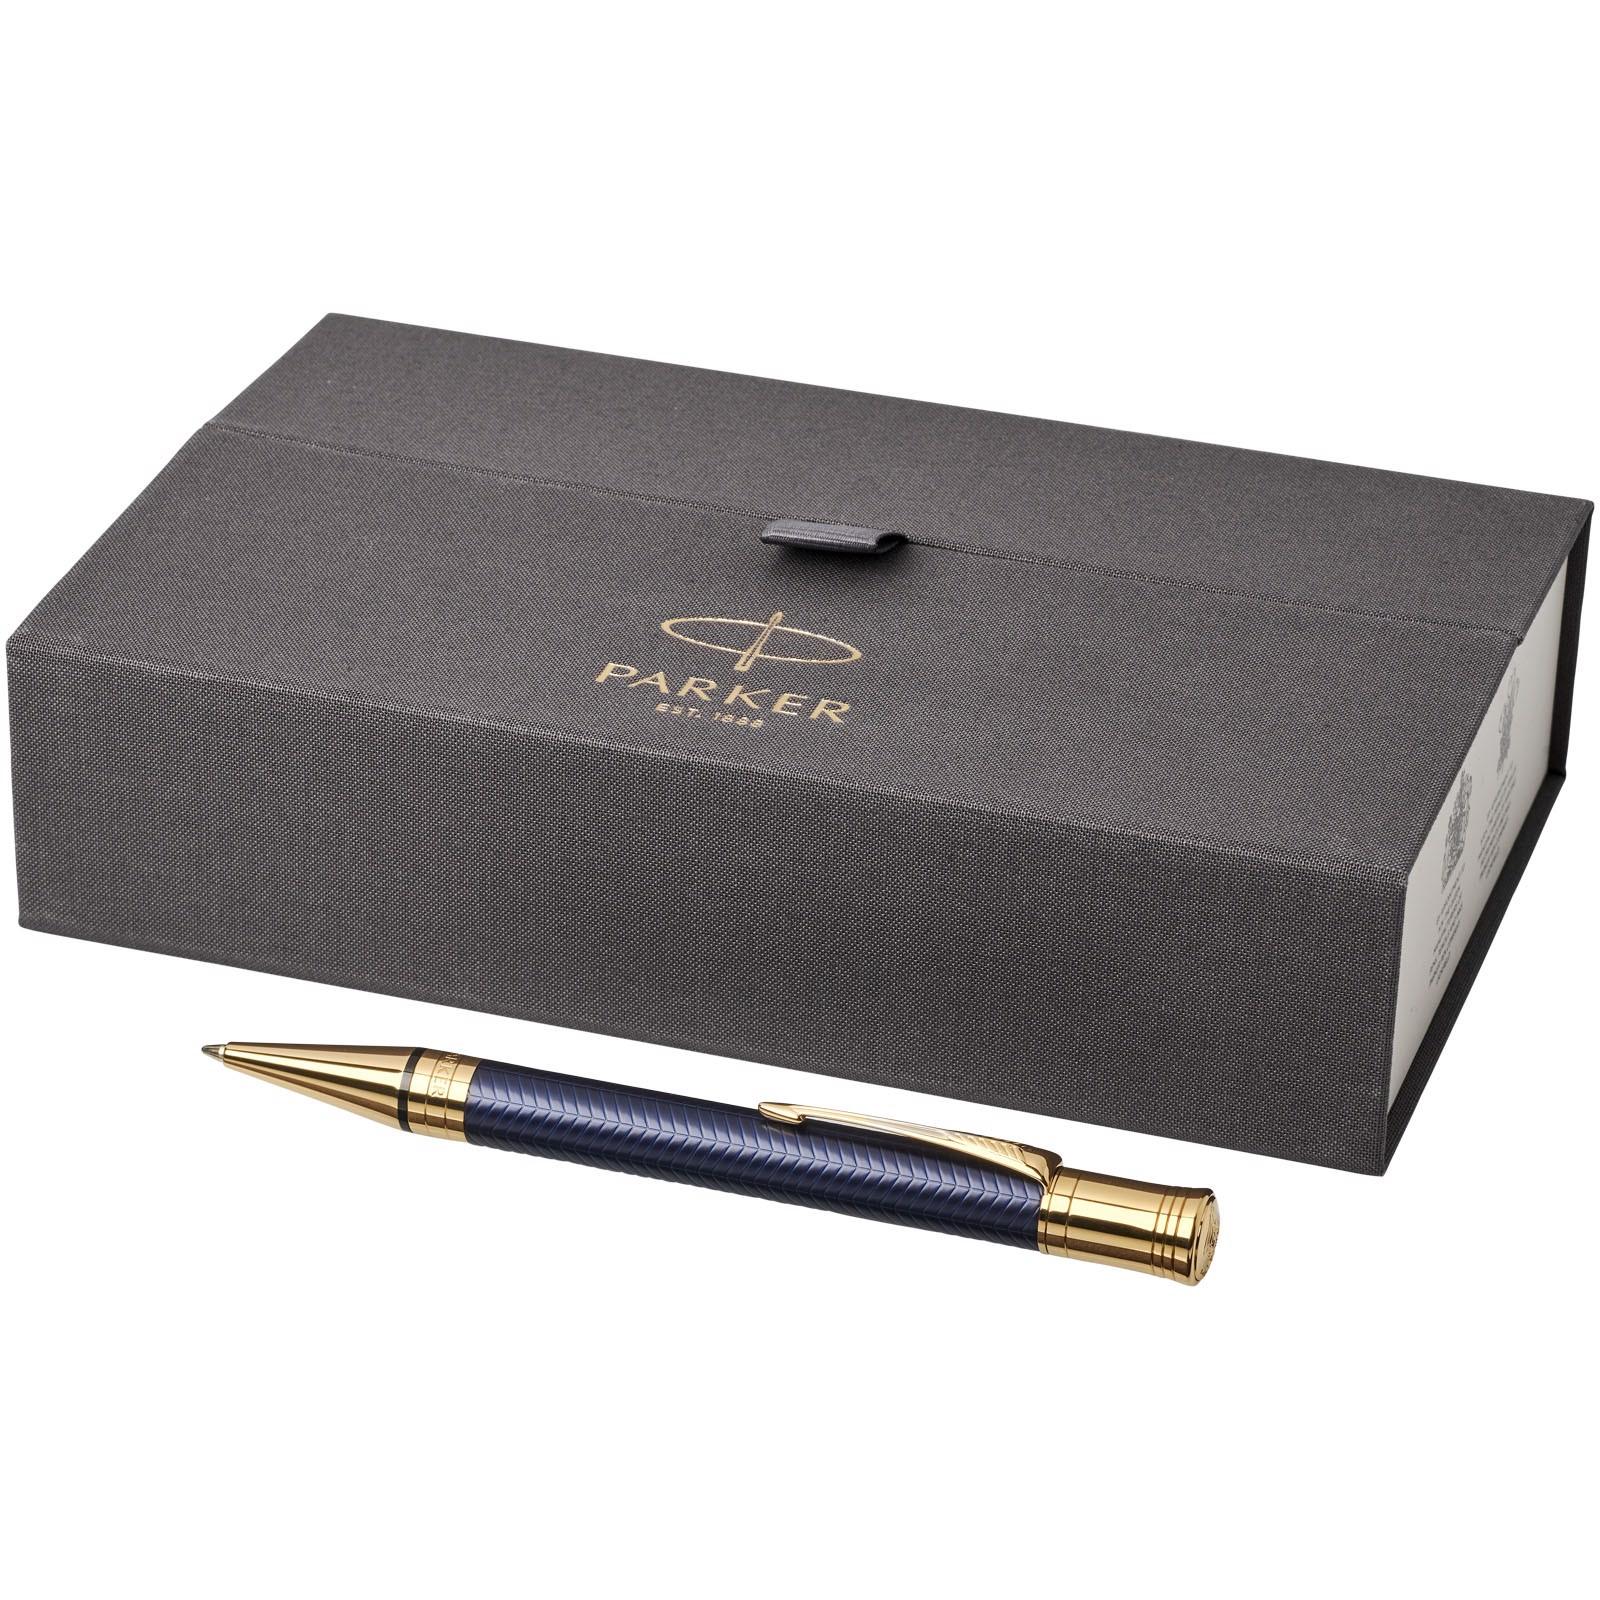 Duofold premium ballpoint pen - Navy / Gold